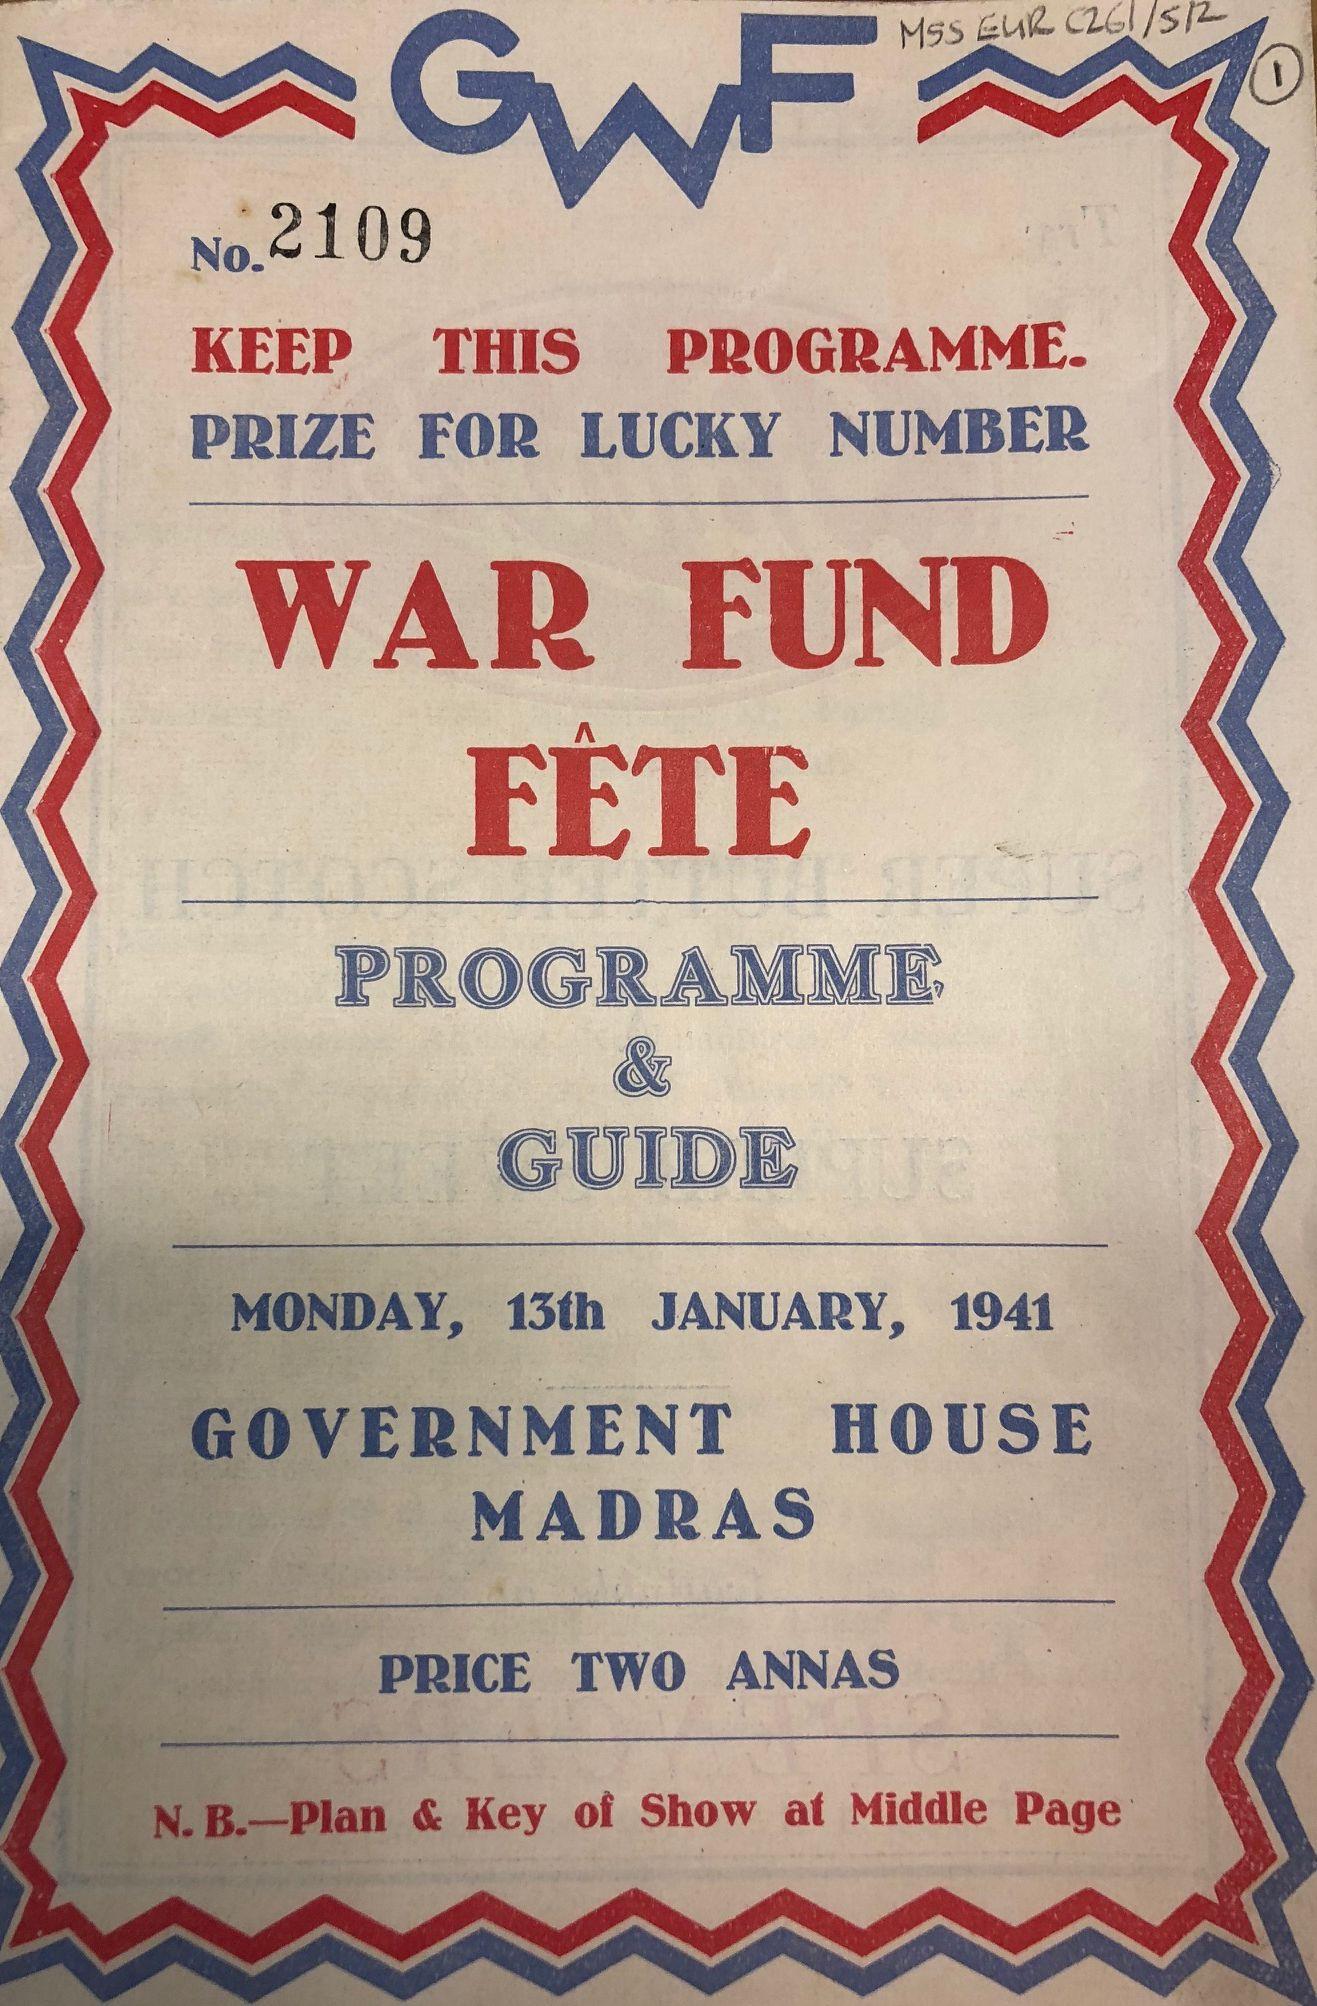 Fete programme cover